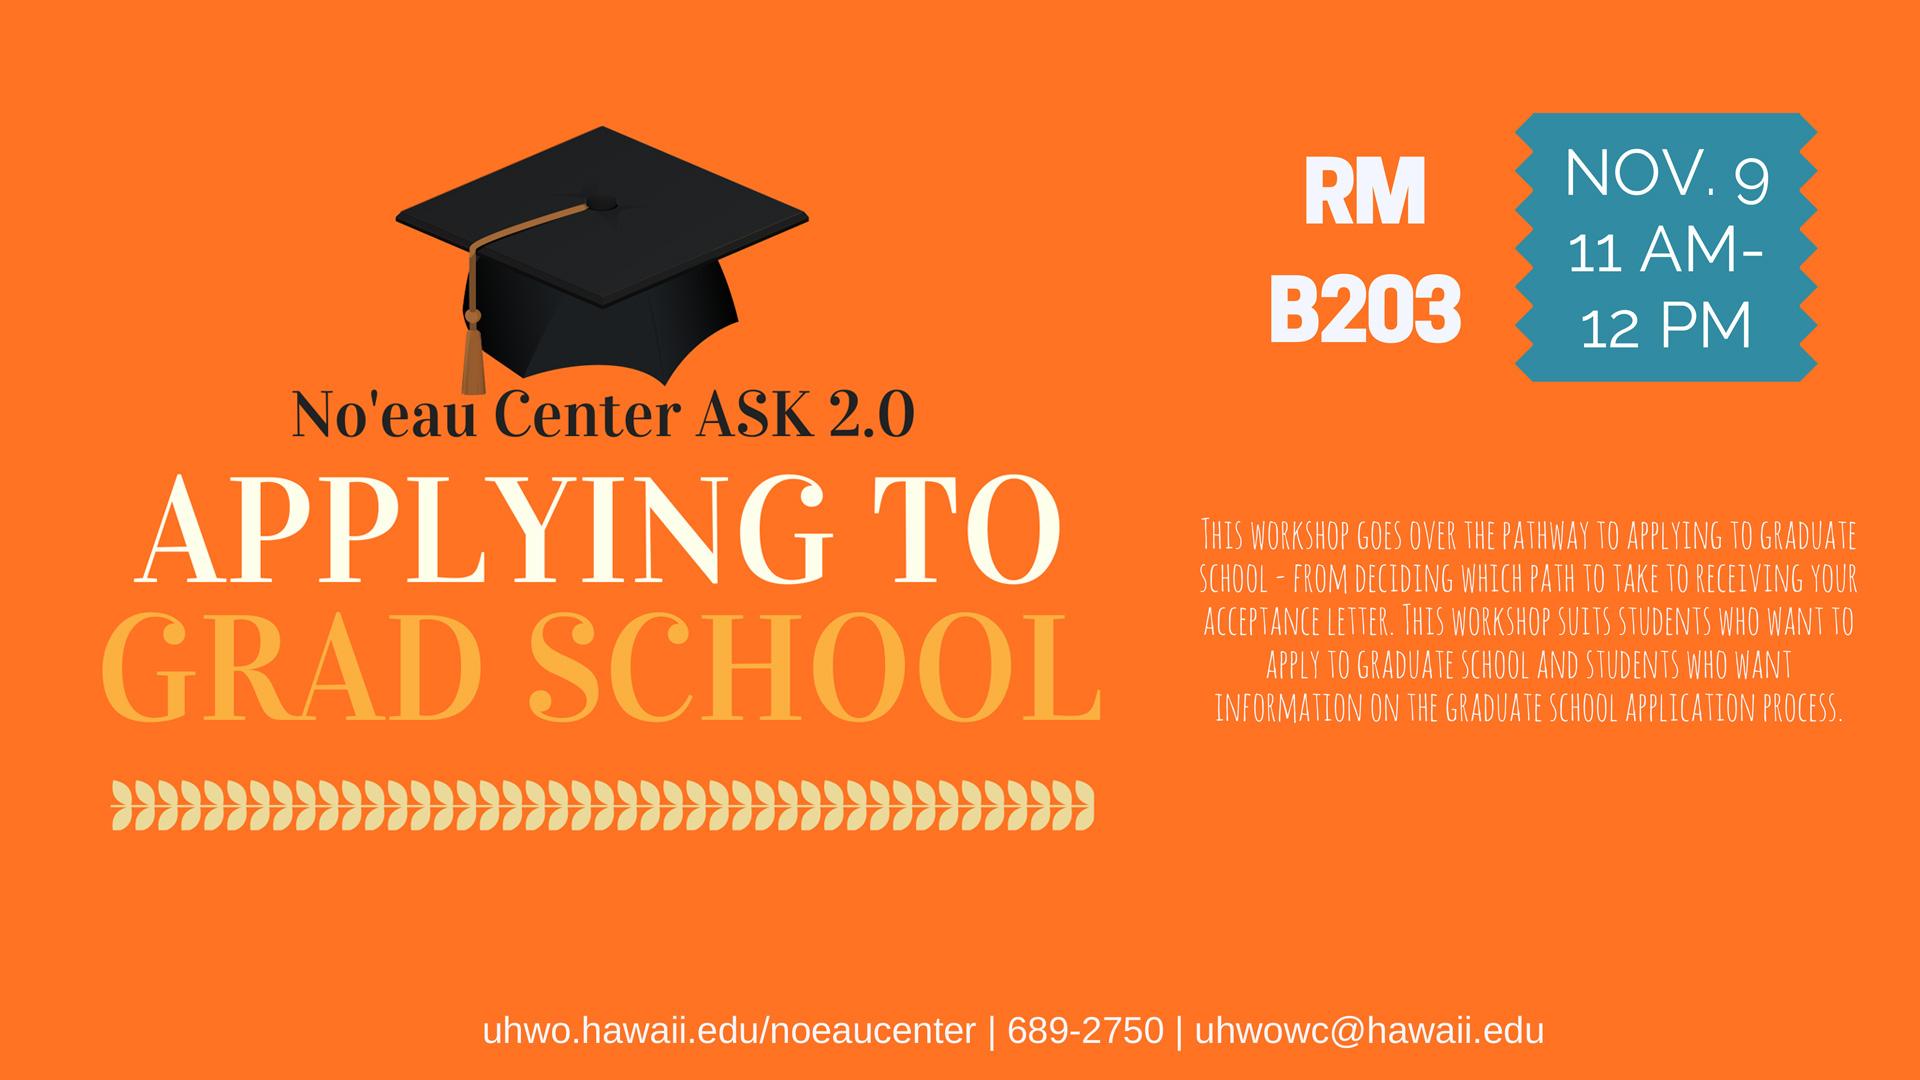 Ask 2.0 Applying to Grad School